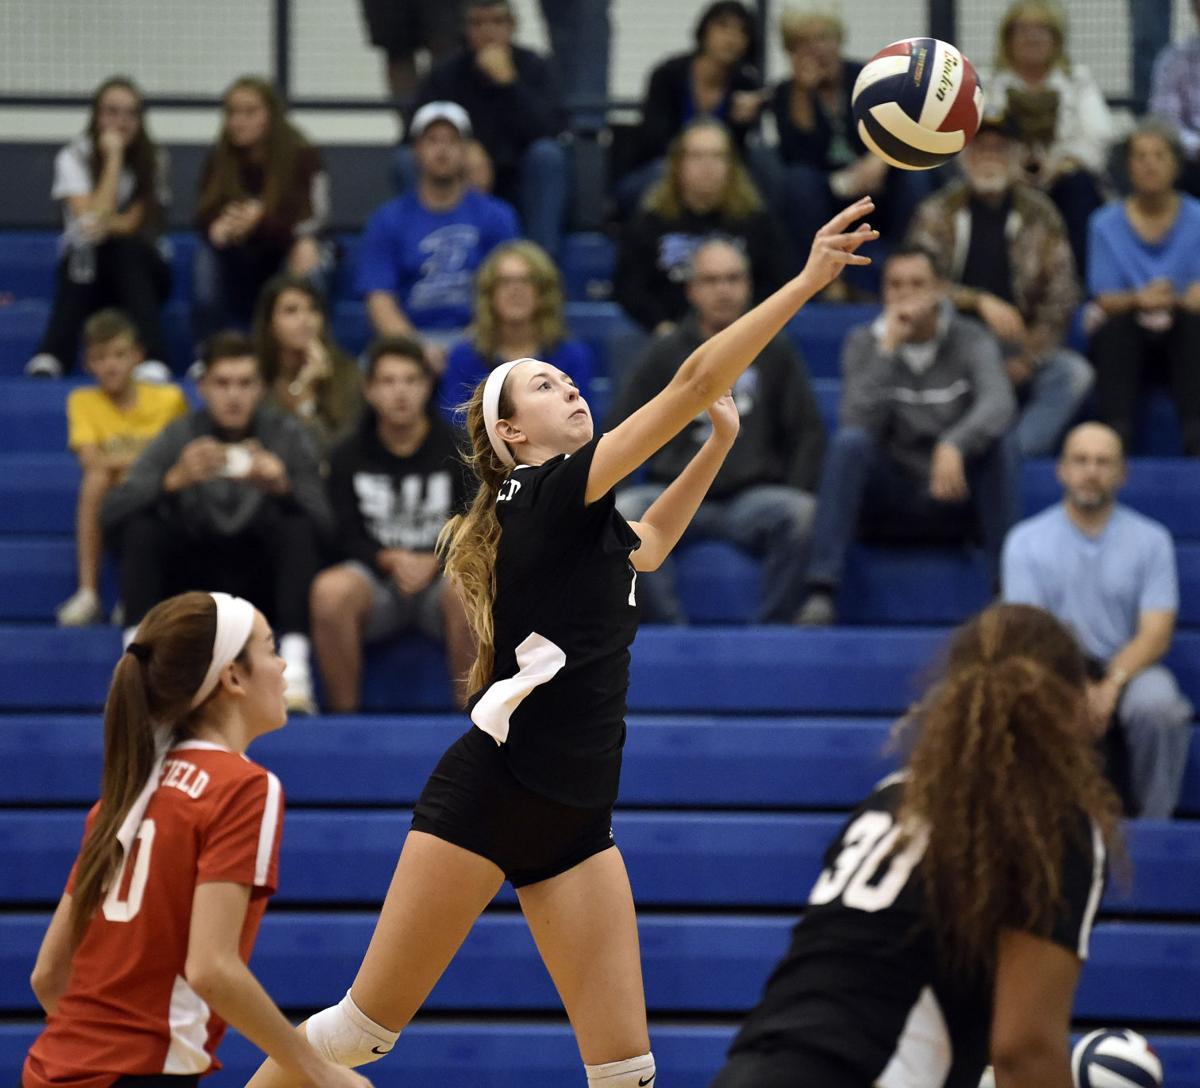 Hempfield vs Elizabethtown-LL Girls Volleyball